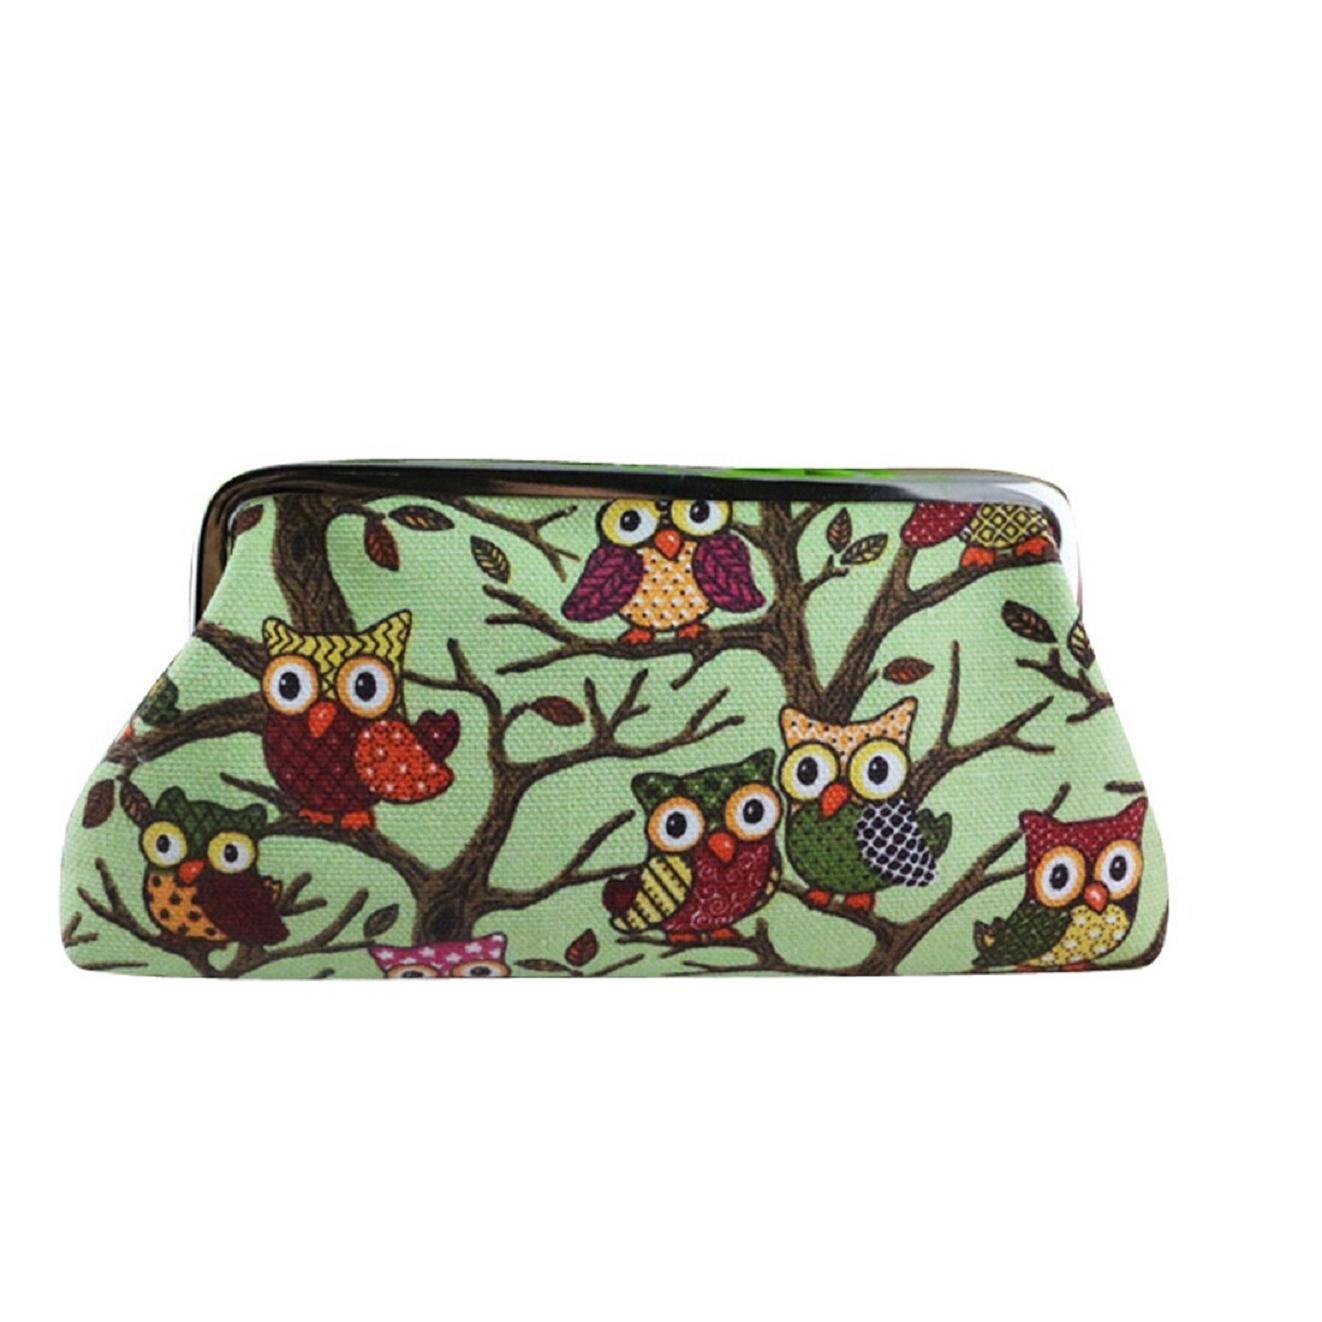 ABC® Women Lovely Hasp Owl Purse Clutch Bag (Green)